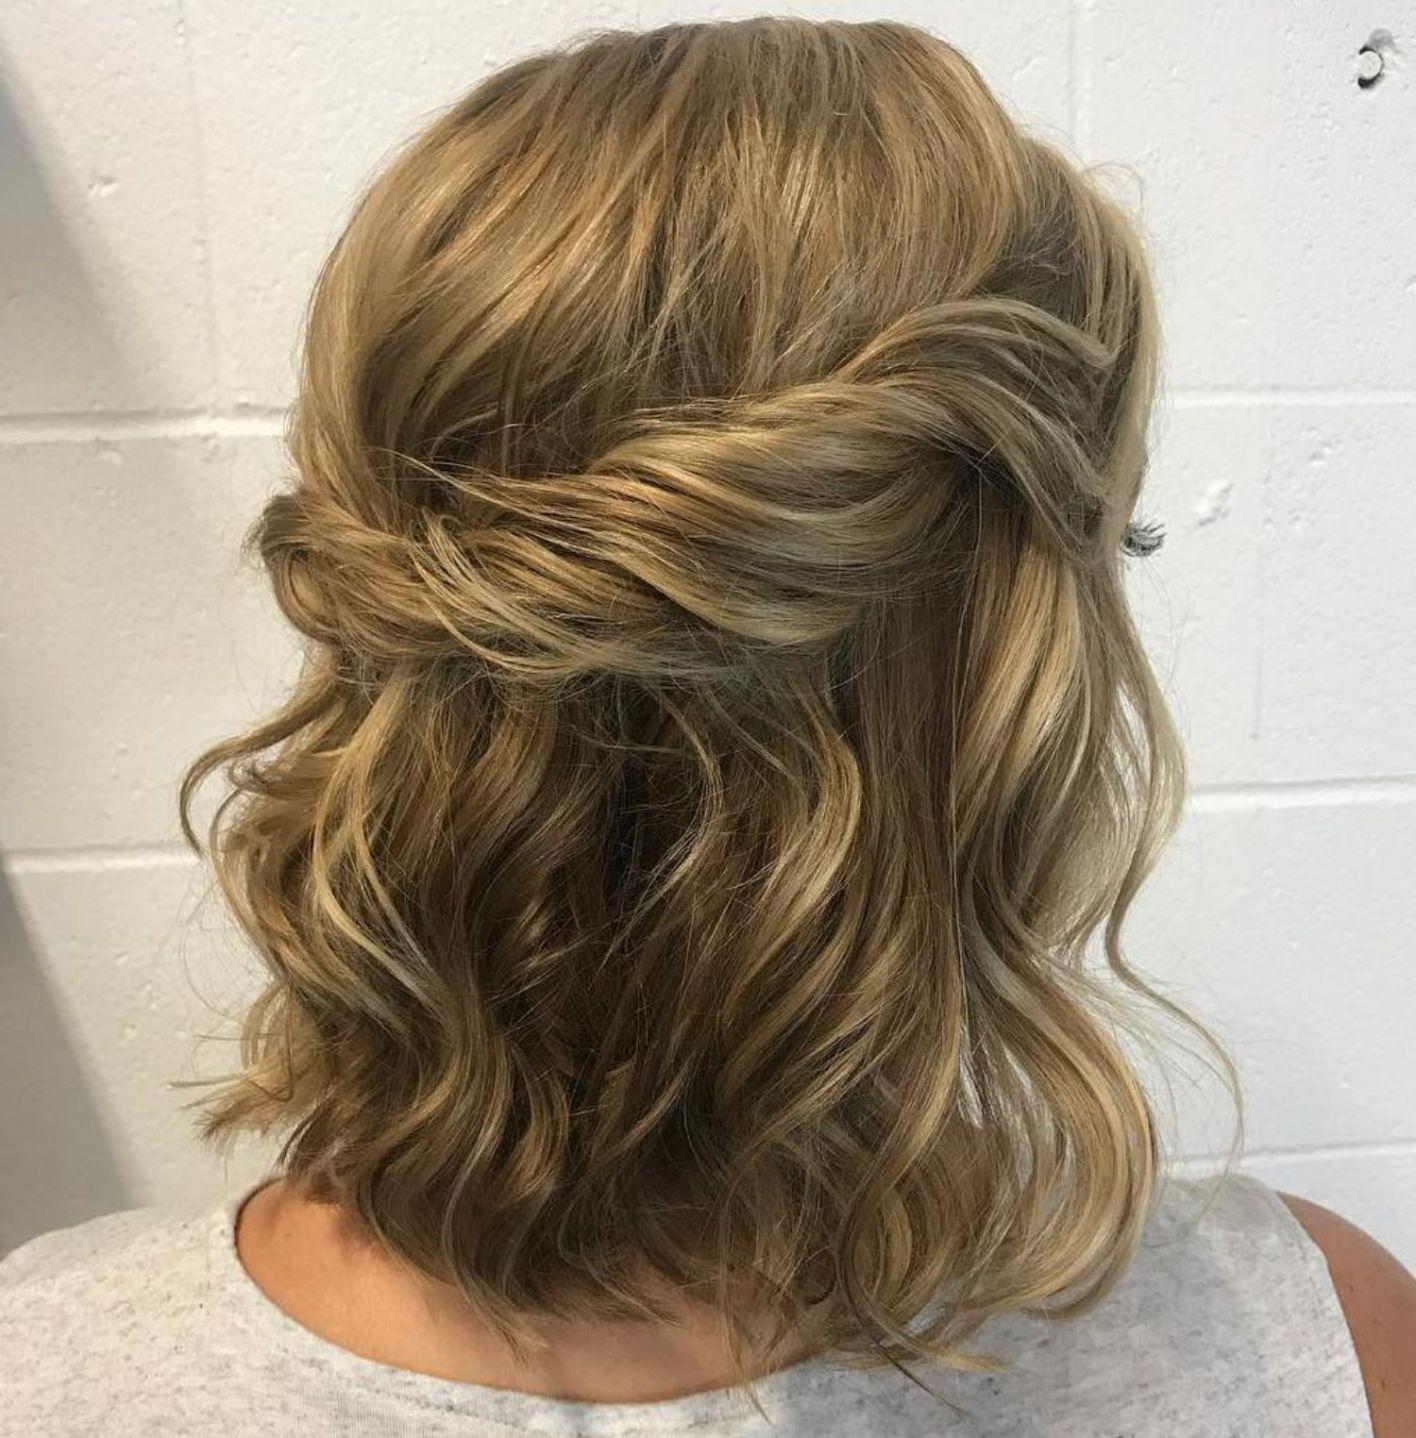 trendiest updos for medium length hair in maid of honor